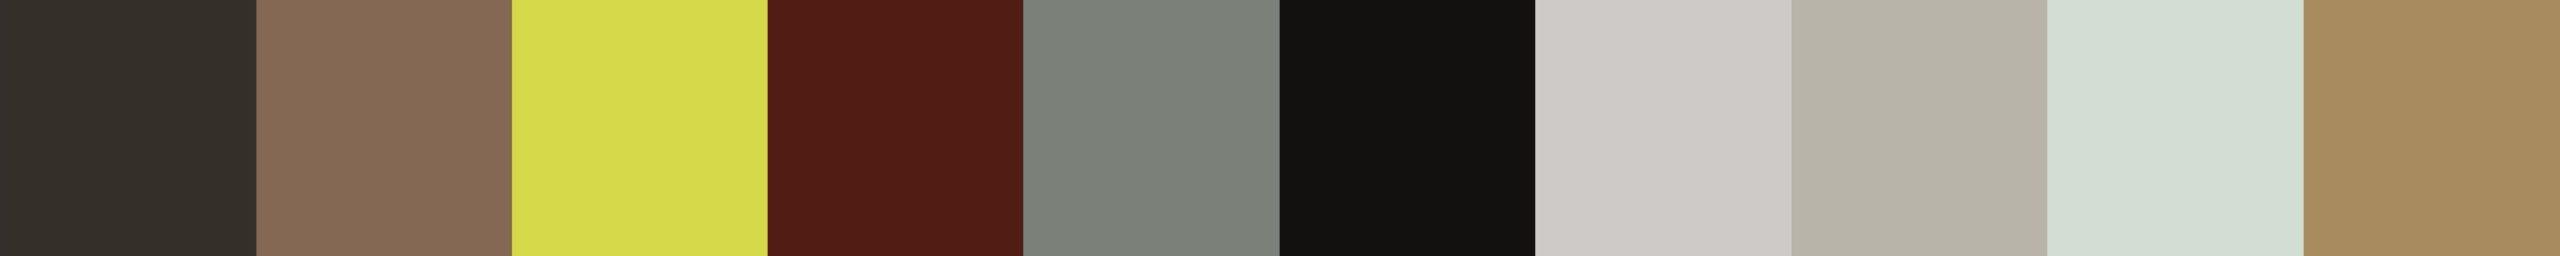 682 Ecounta Color Palette